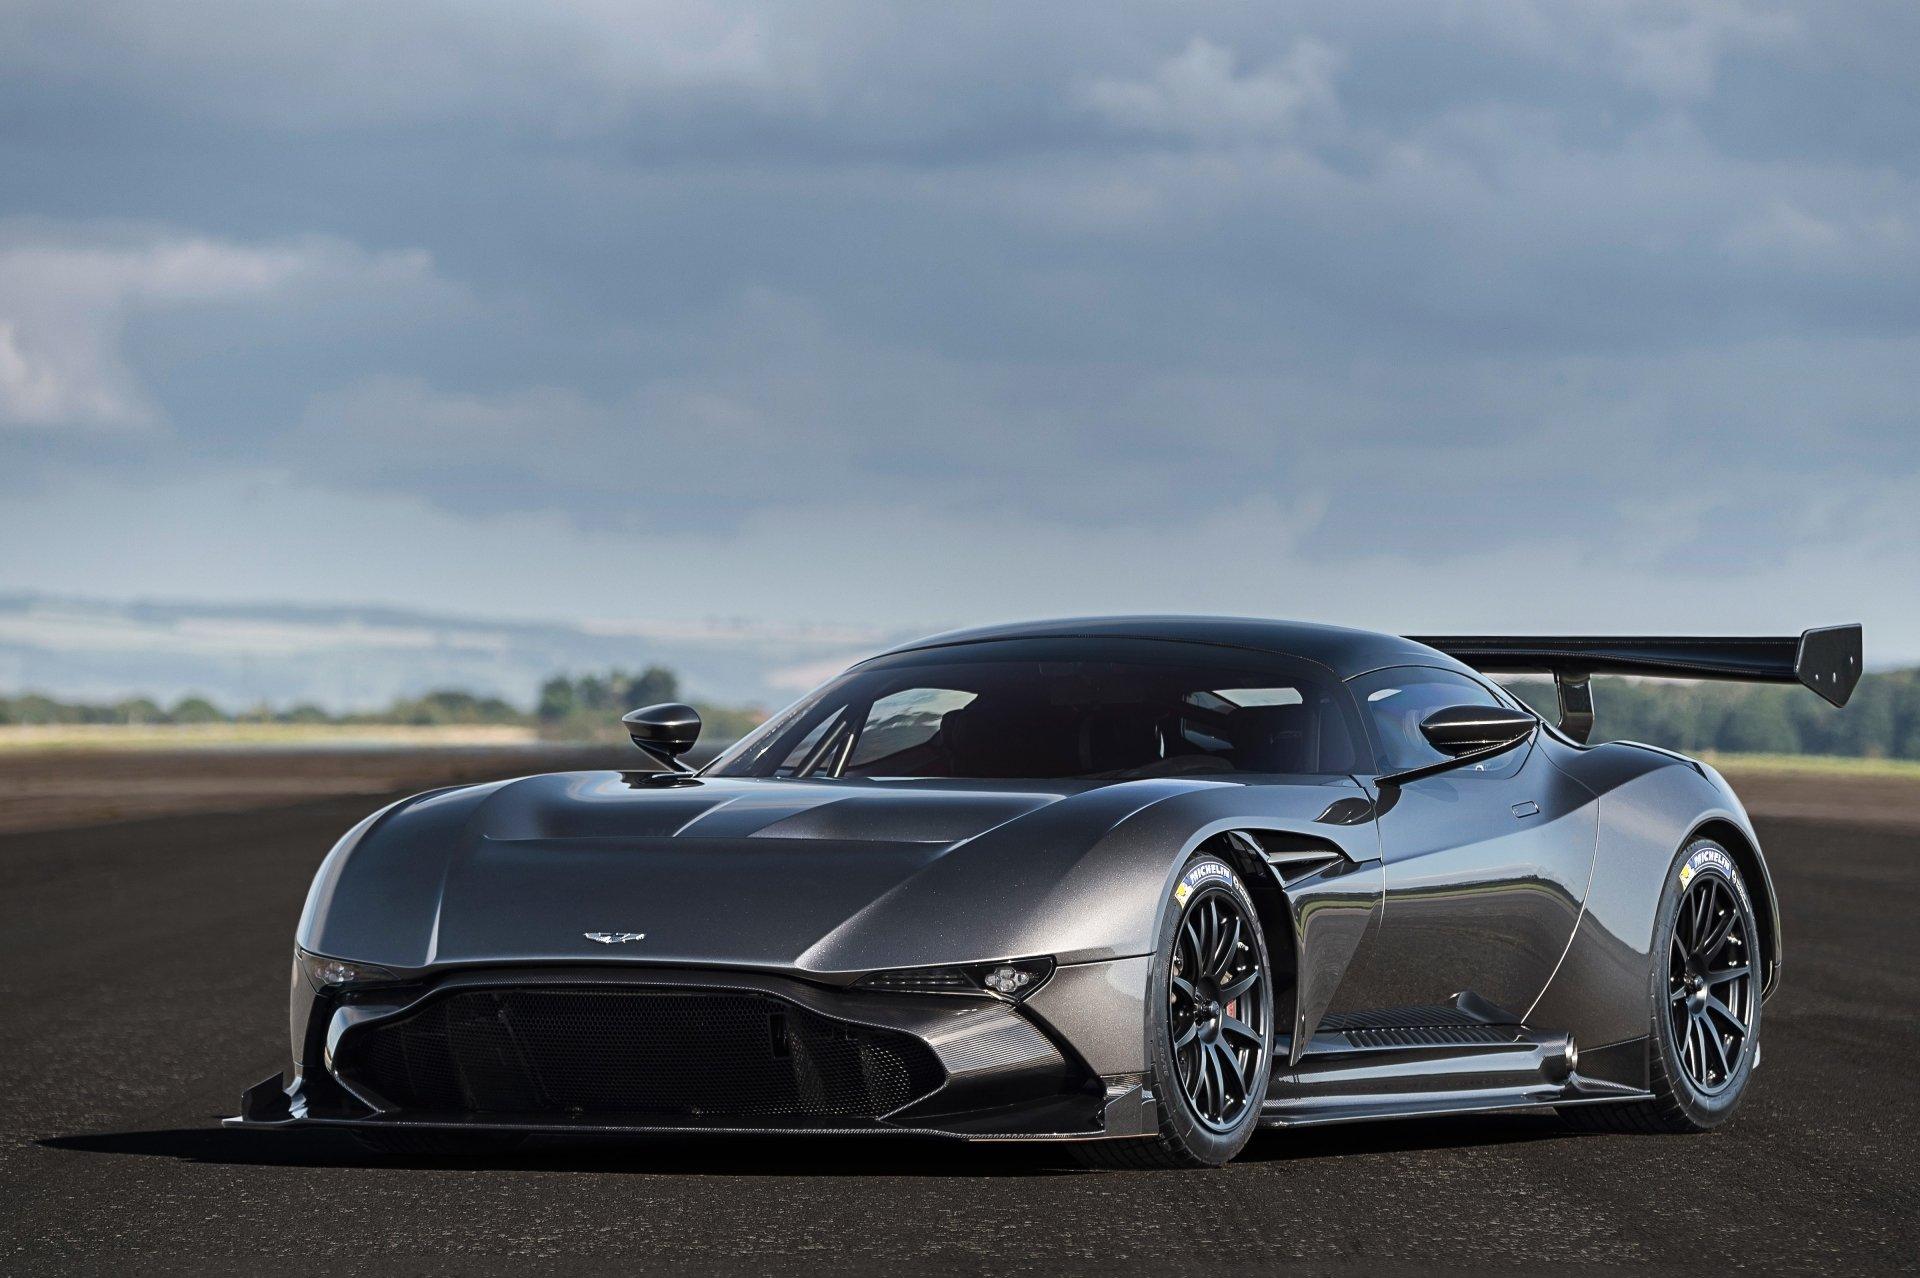 Véhicules - Aston Martin Vulcan  Véhicule Supercar Voiture de course Fond d'écran